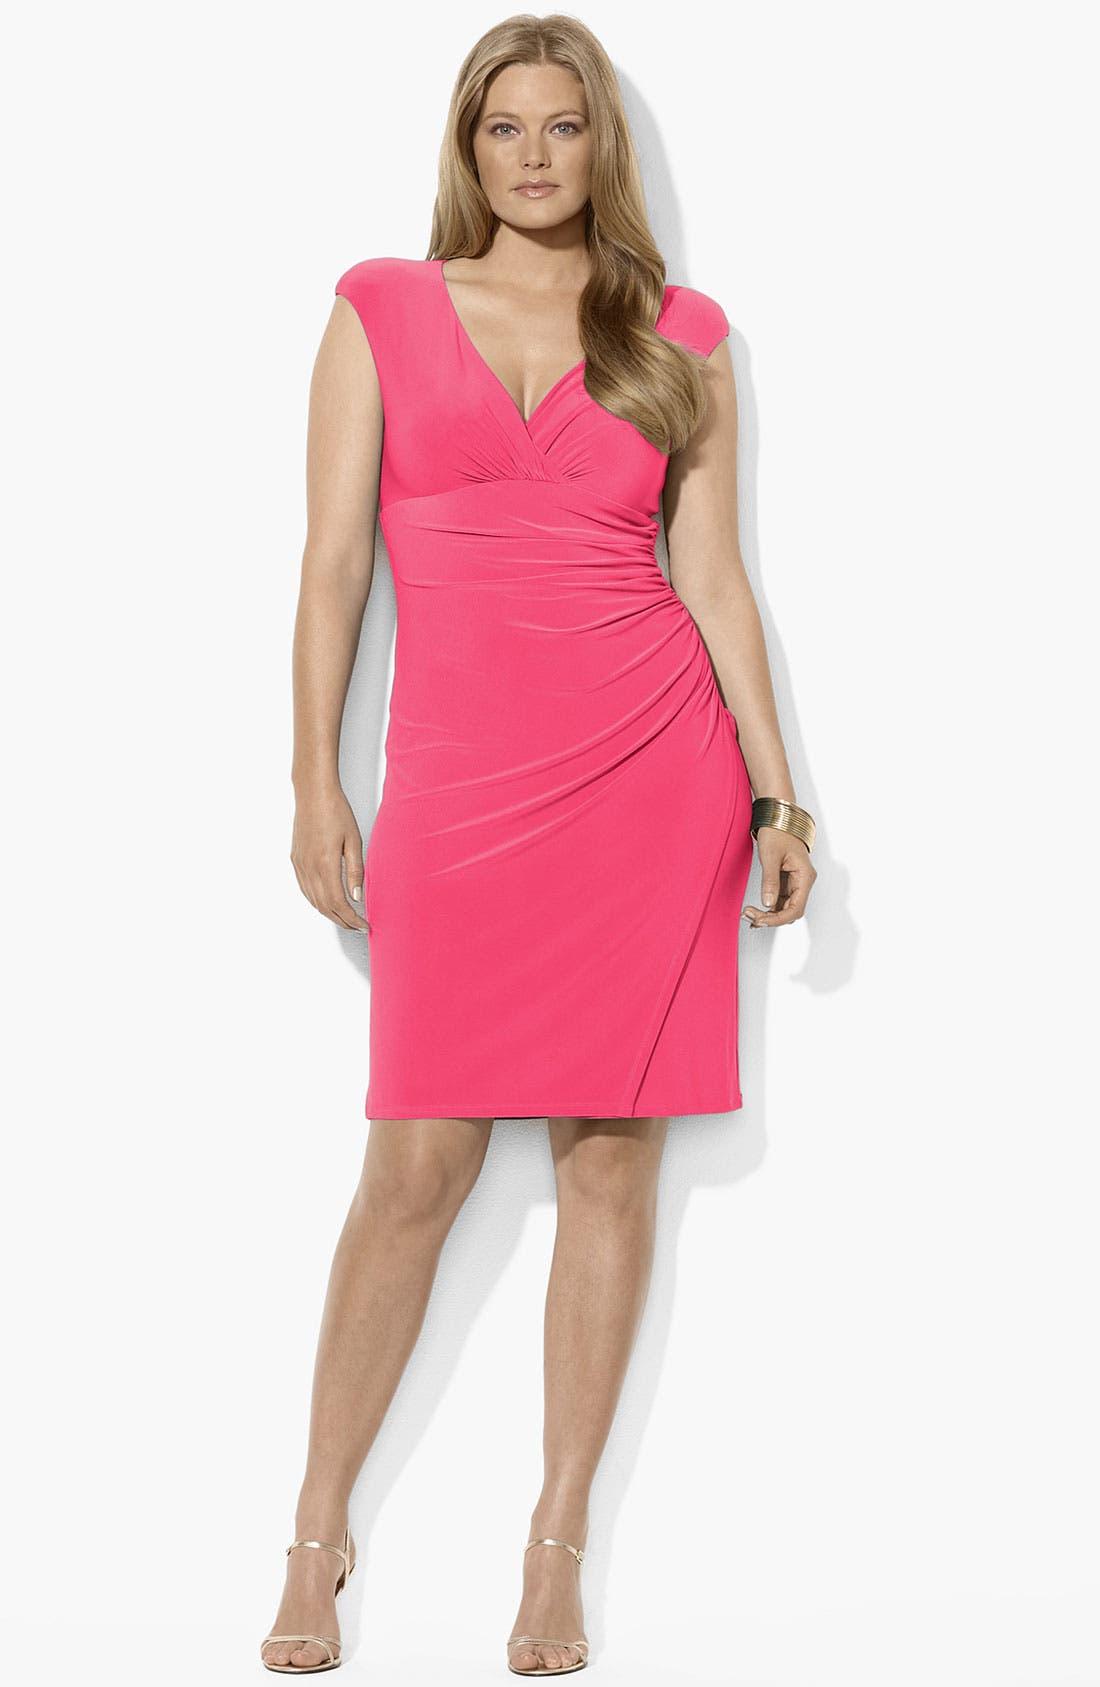 Alternate Image 1 Selected - Lauren Ralph Lauren Ruched Jersey Dress (Plus Size) (Online Only)